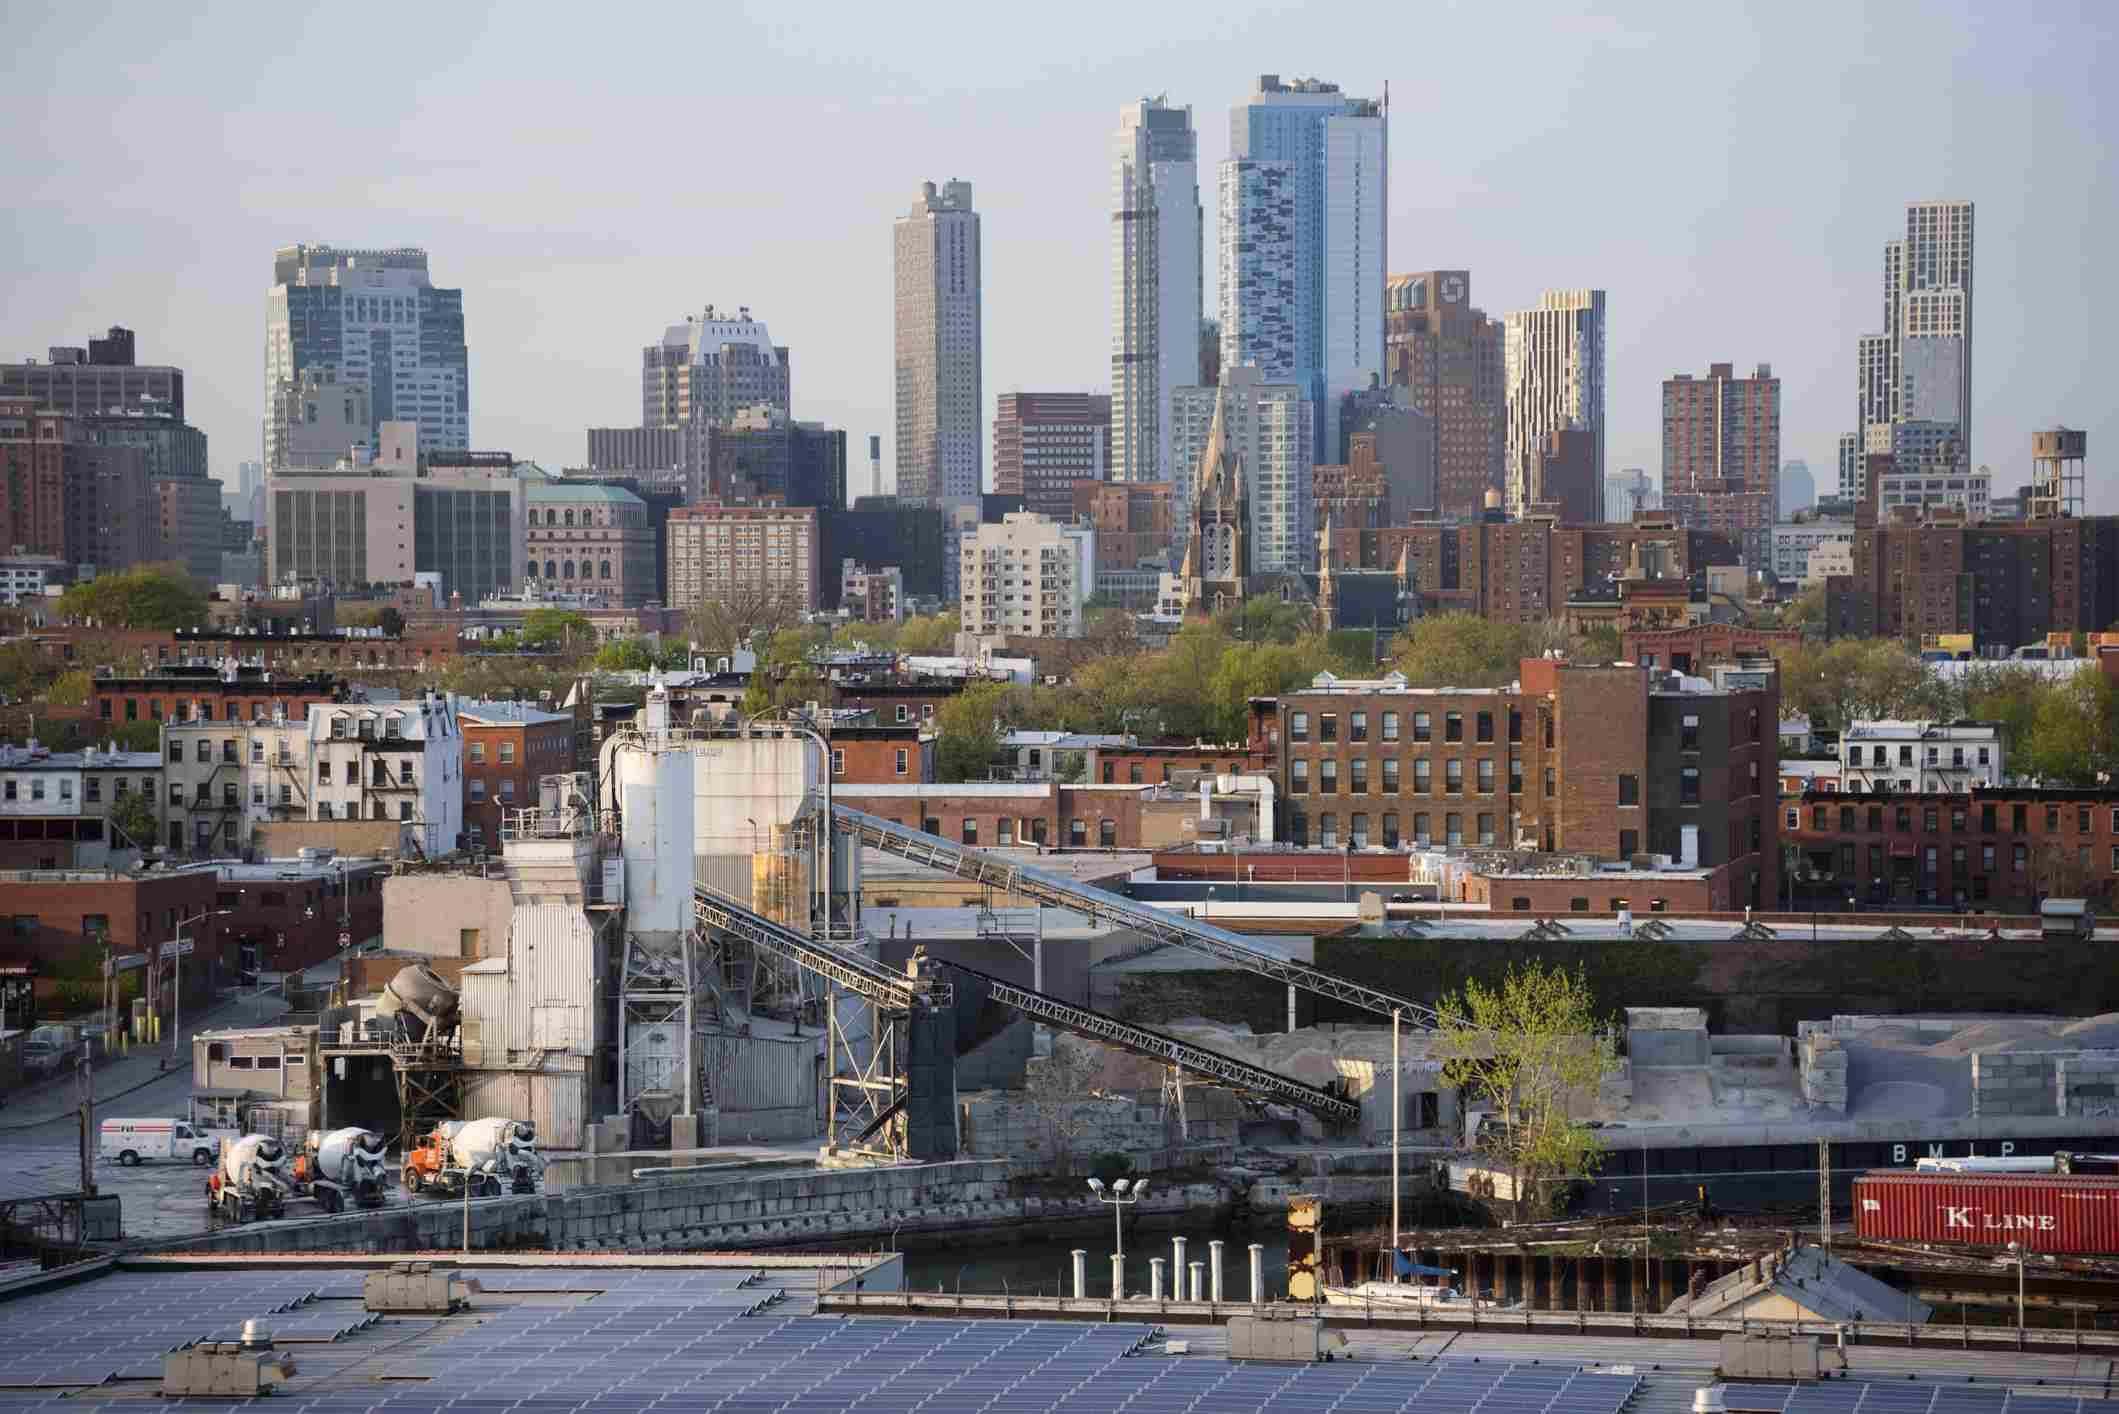 USA, New York State, New York City, Panorama of Brooklyn